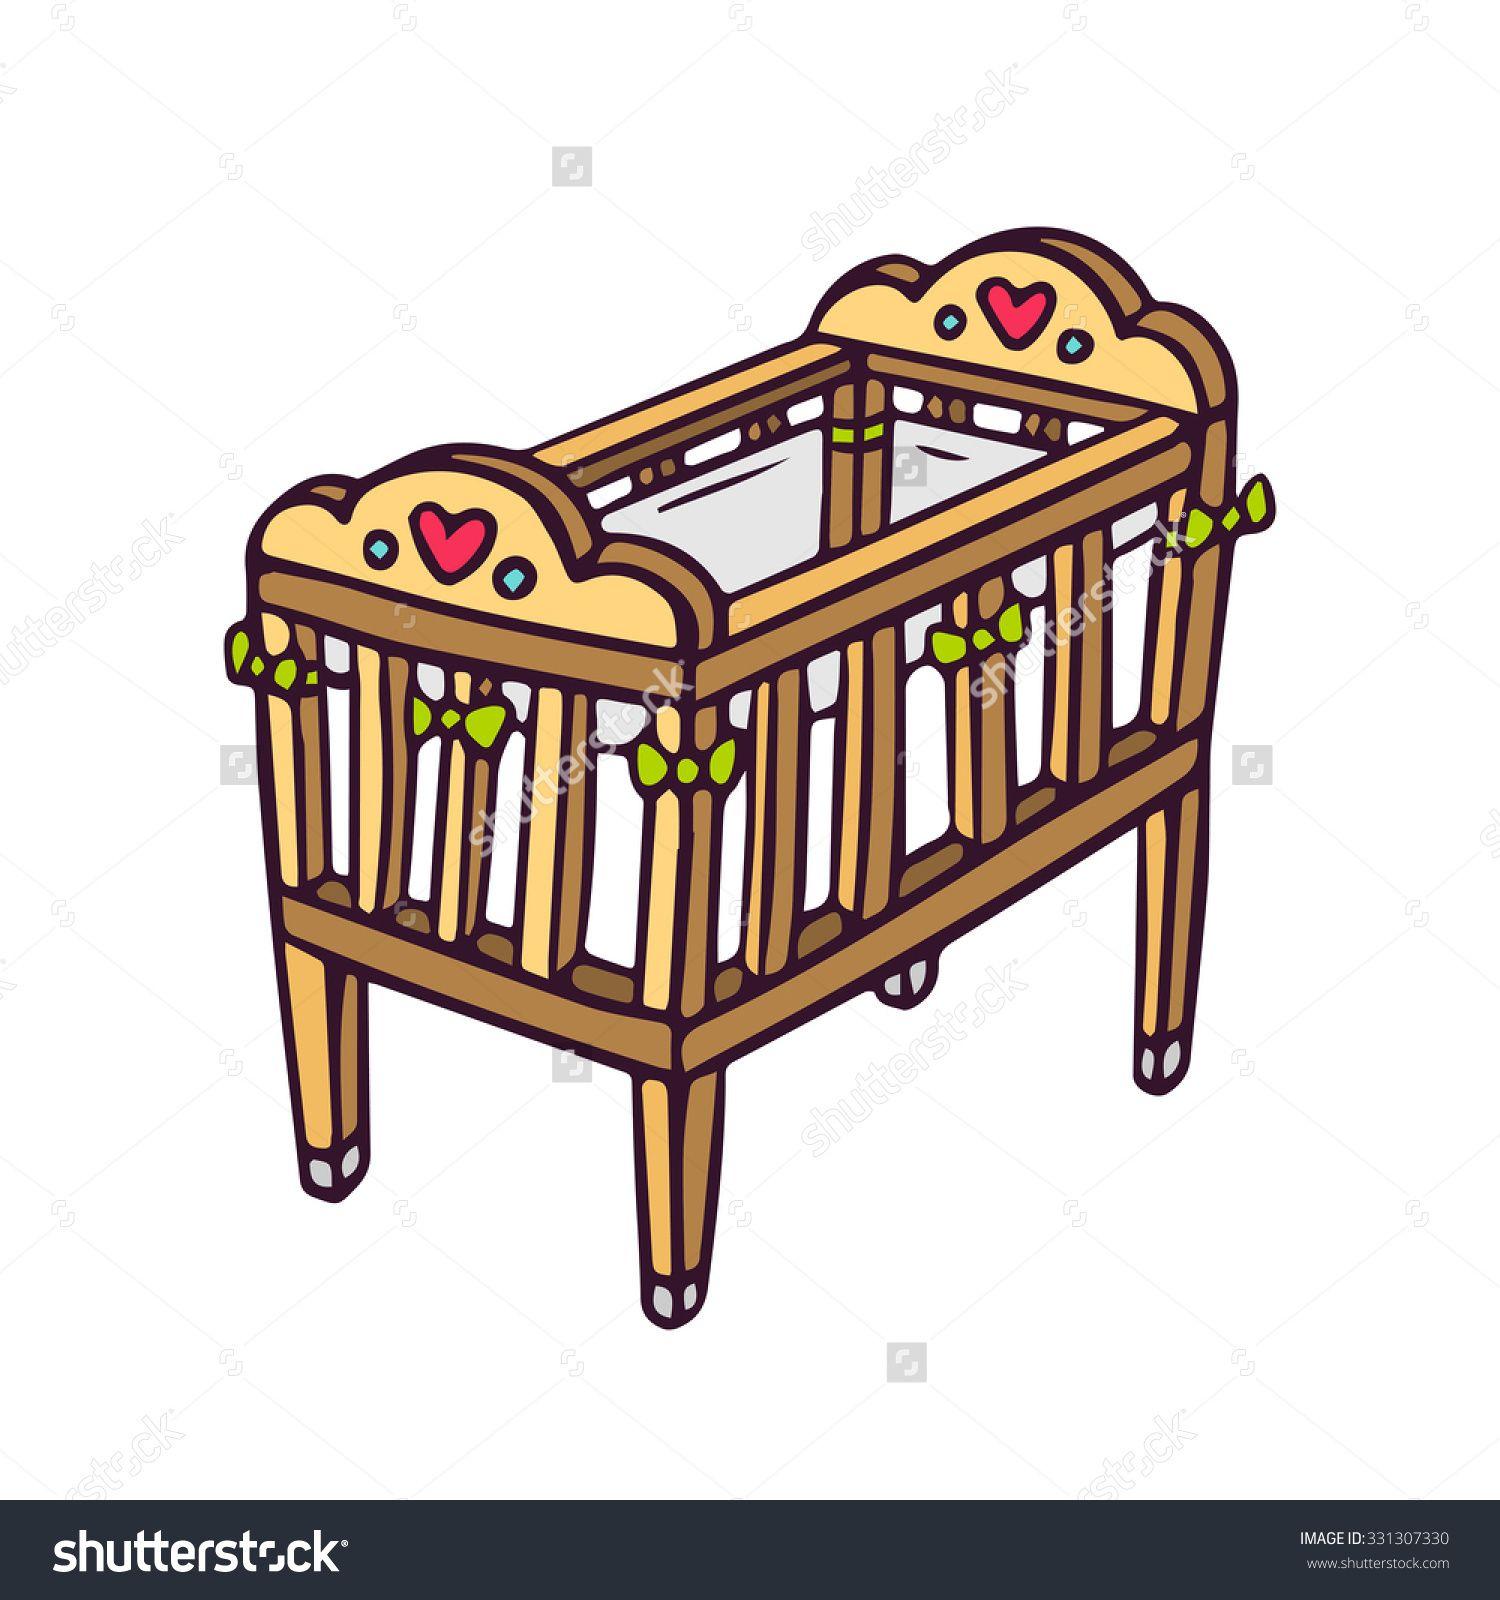 Wooden crib clipart clip art royalty free Clipart Cot - Clip Arts Galleries | crib | Cot, Cribs, Furniture clip art royalty free